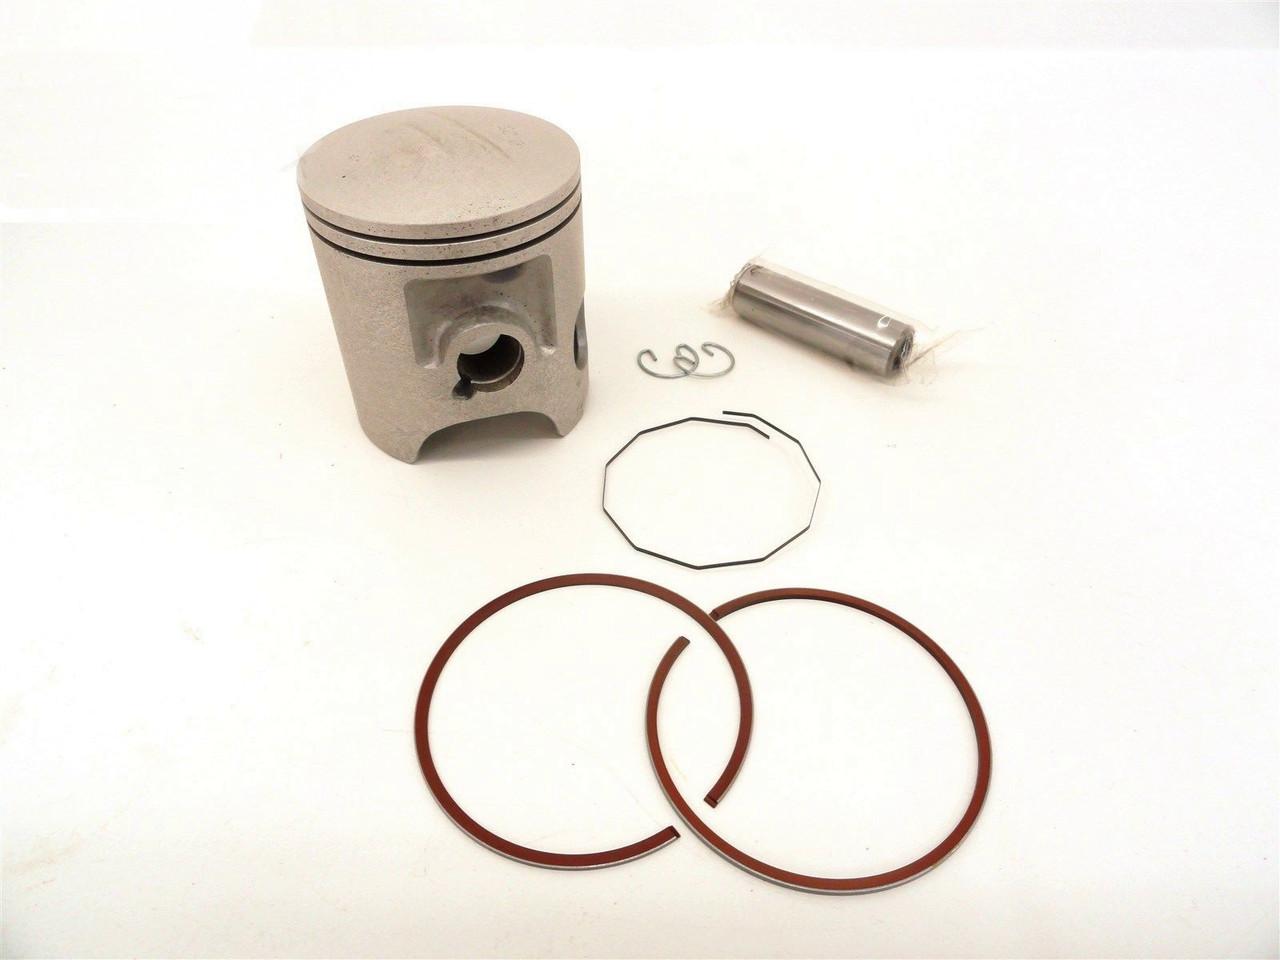 cylinder piston rings 25mm over bore 64 25mm yamaha 87 06 yfz 350 banshee cyclesrus net [ 1280 x 960 Pixel ]